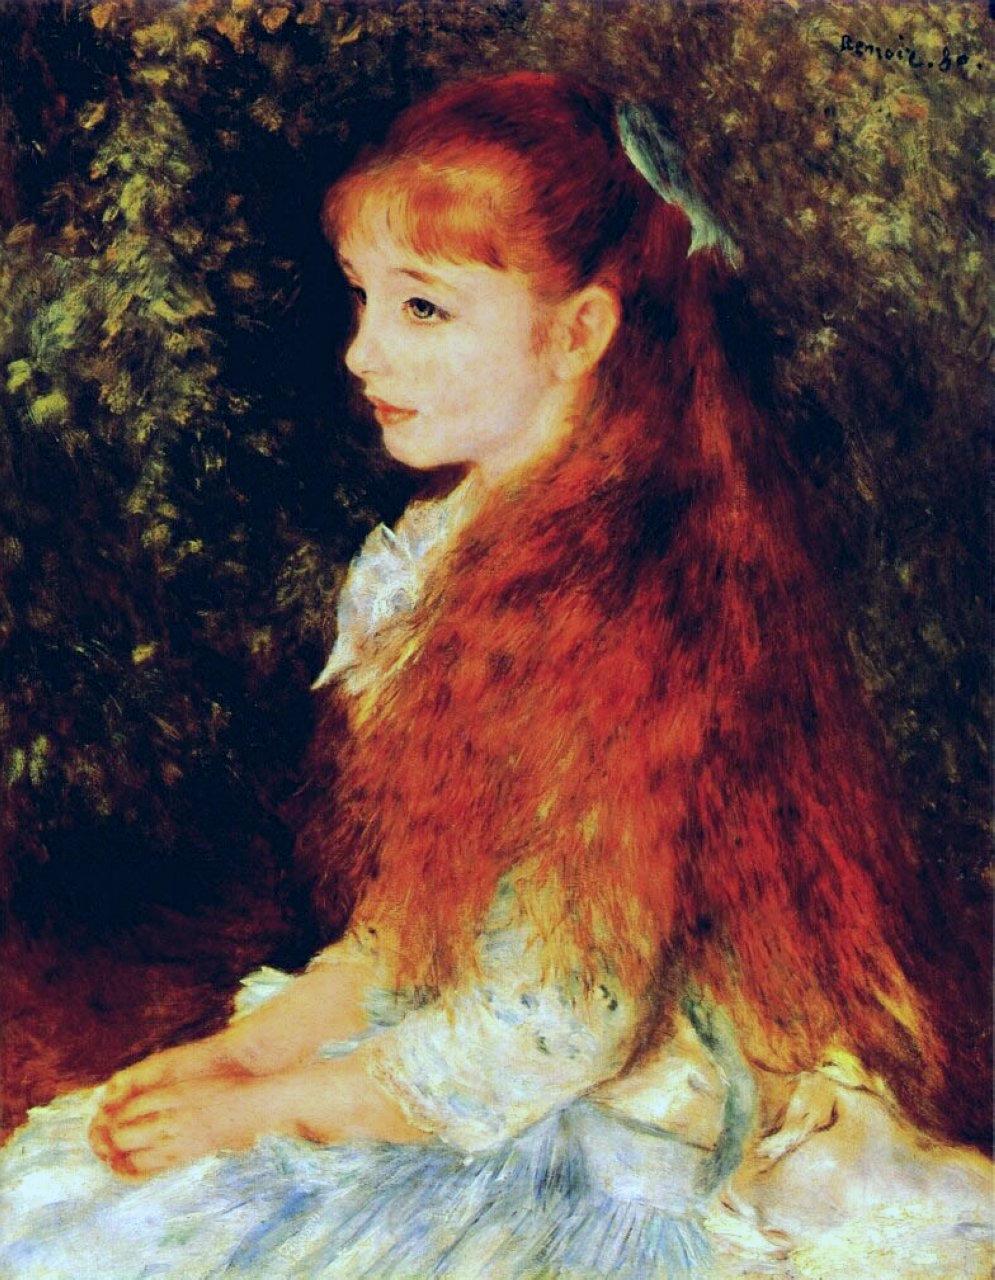 Mlle Irene Cahen d'Anvers, 1880 - Pierre-Auguste Renoir ...